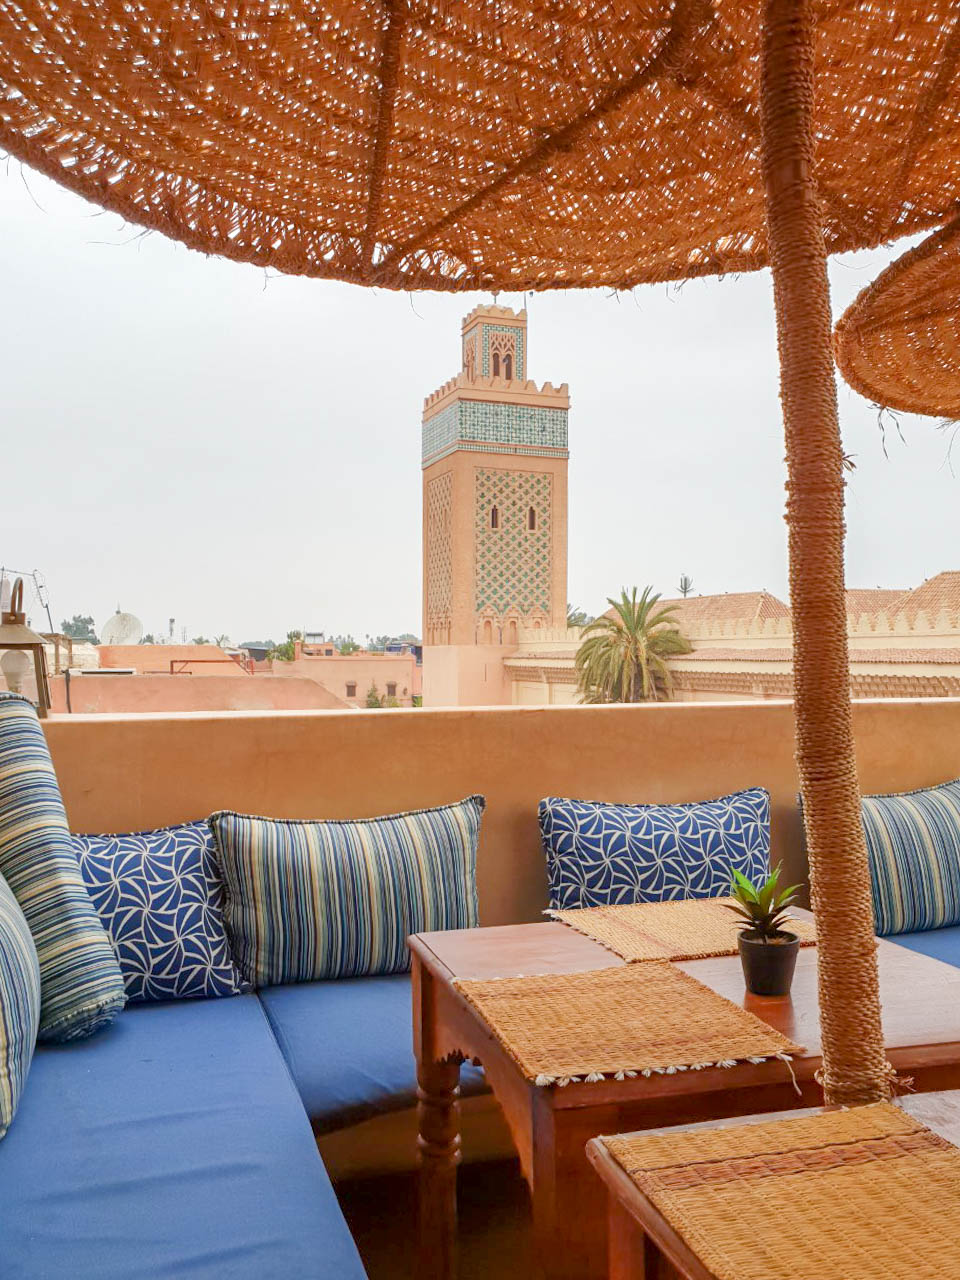 Kasbah café marrakech